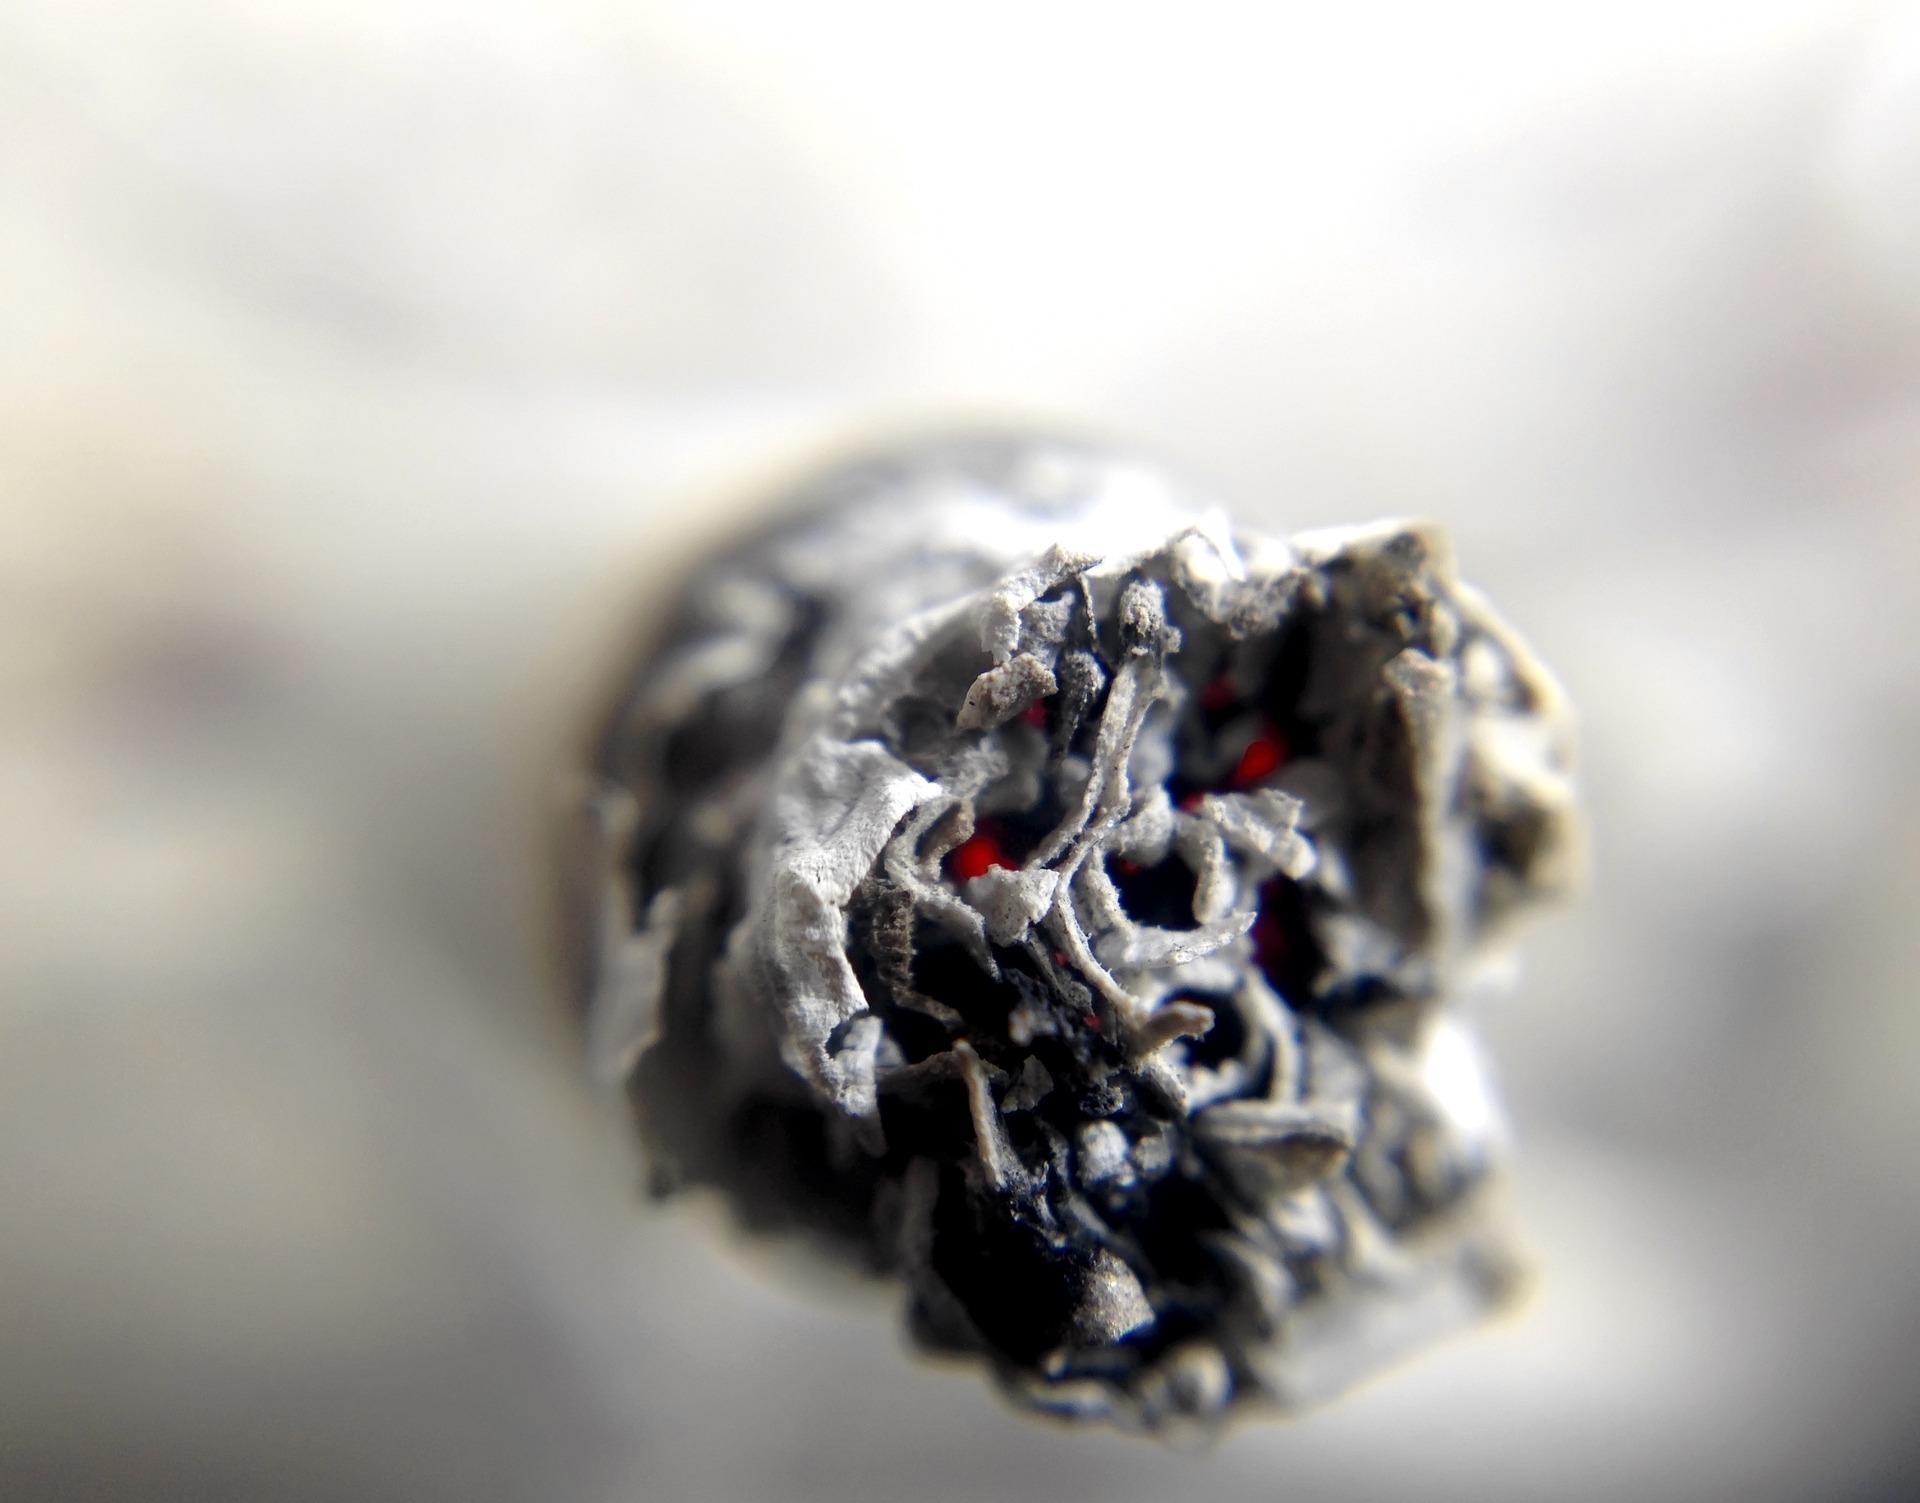 1606120347-cigarette-1270516-1920.jpeg